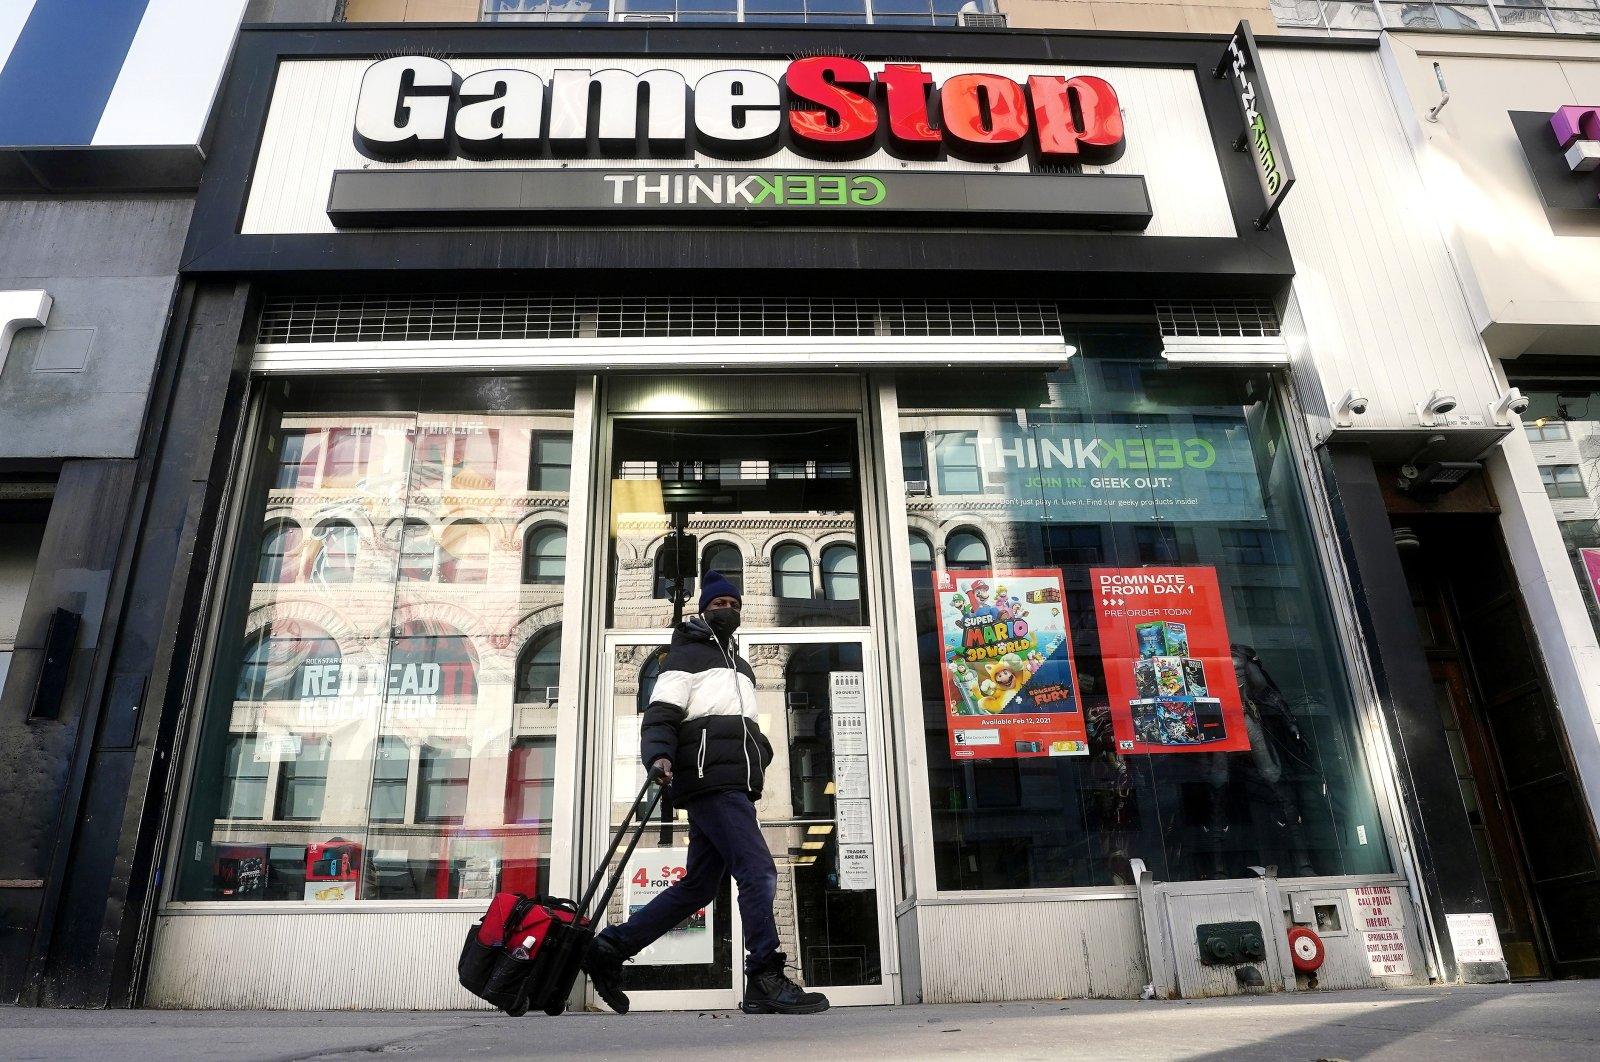 A person walks past a GameStop store in Manhattan, New York City, New York, U.S., Jan. 29, 2021. (Reuters File Photo)